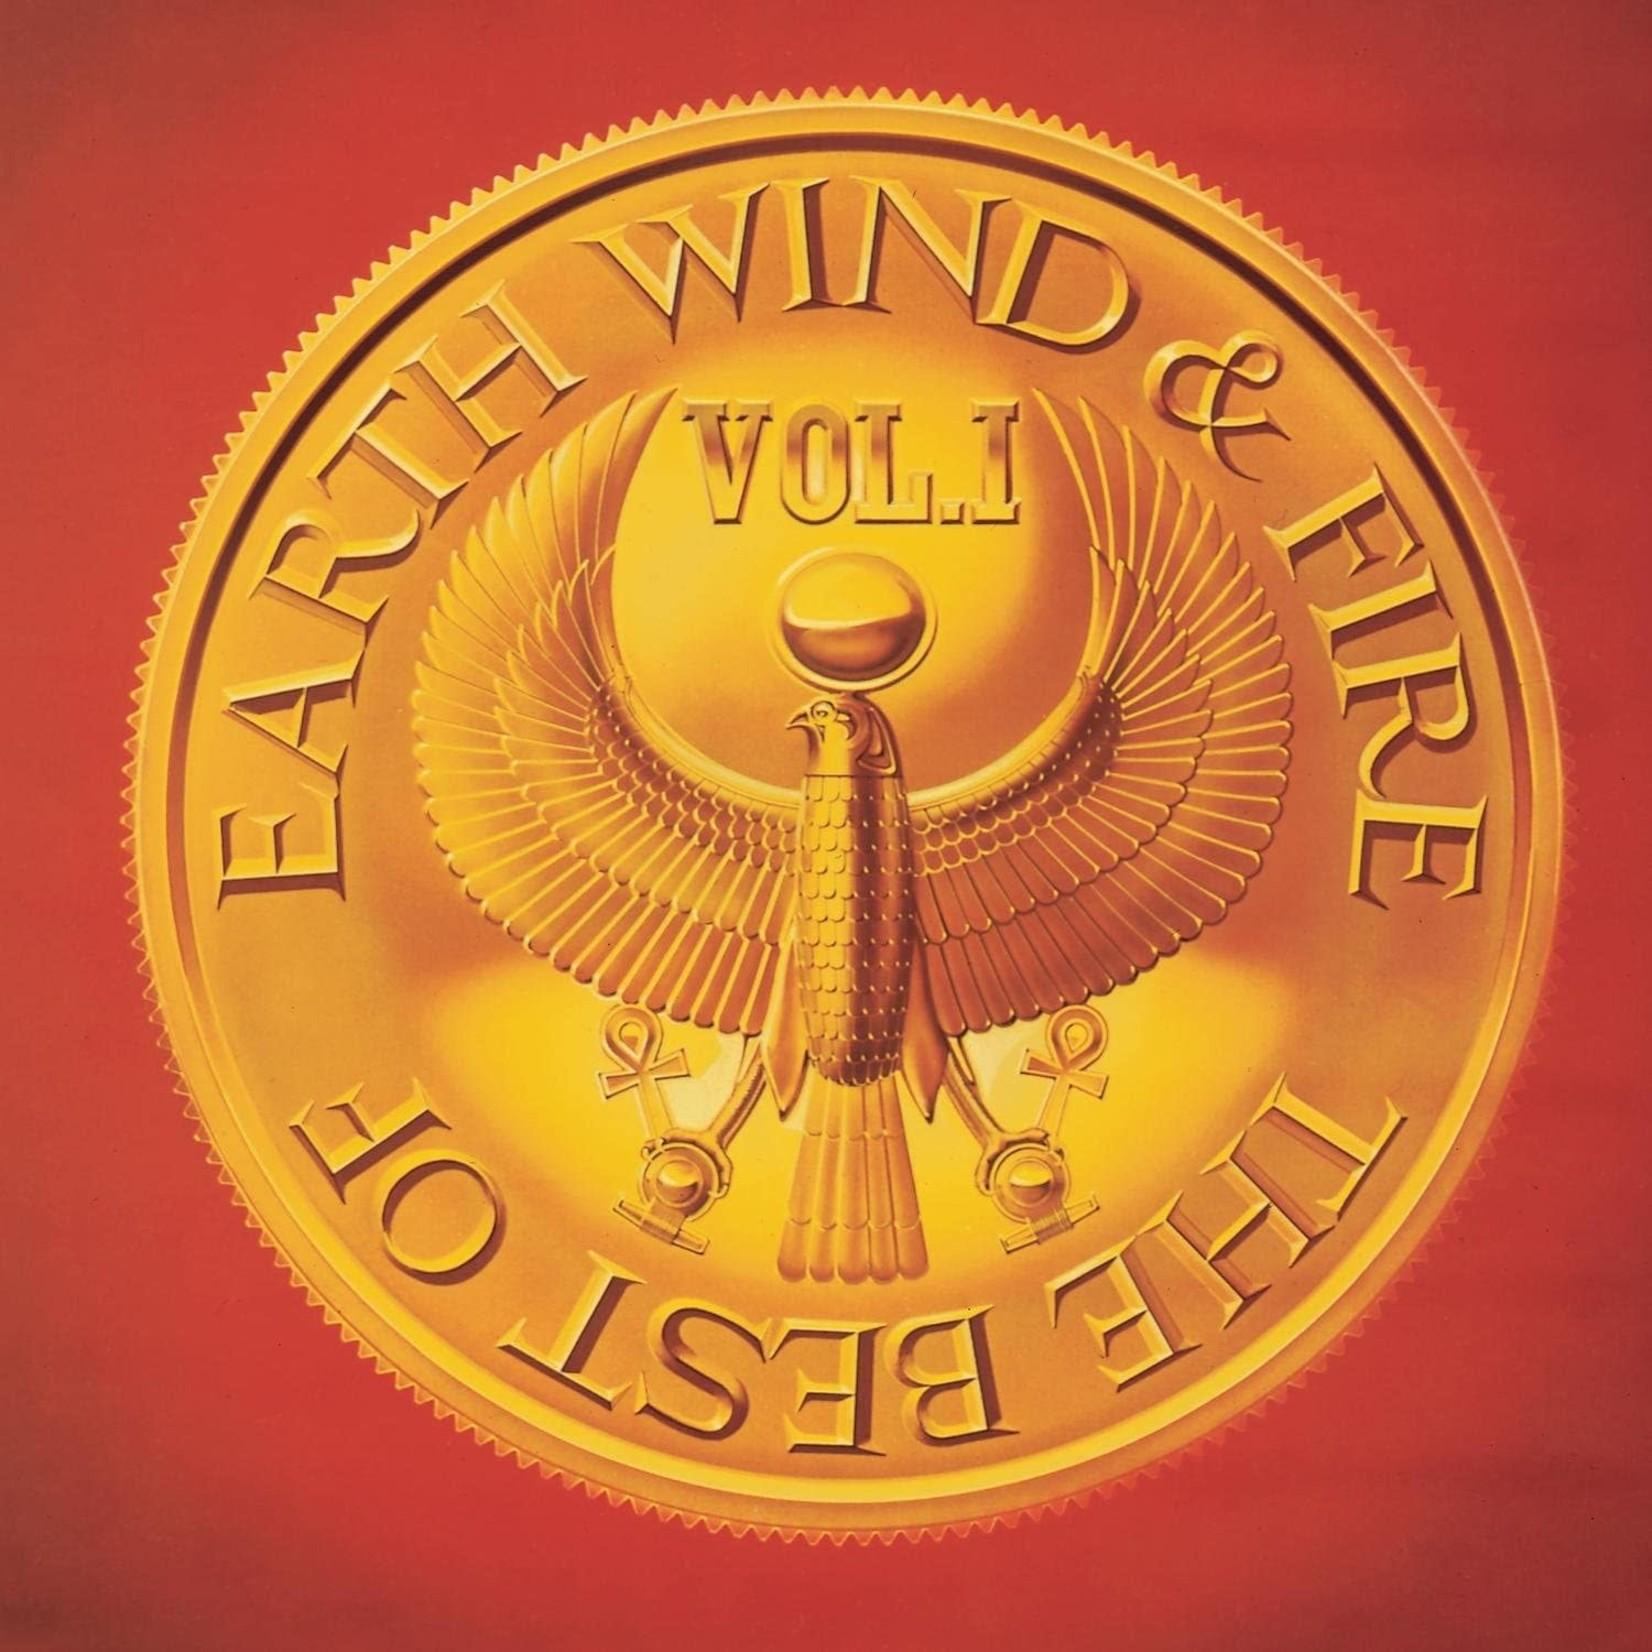 [Vintage] Earth, Wind & Fire: Best of... Vol. 1